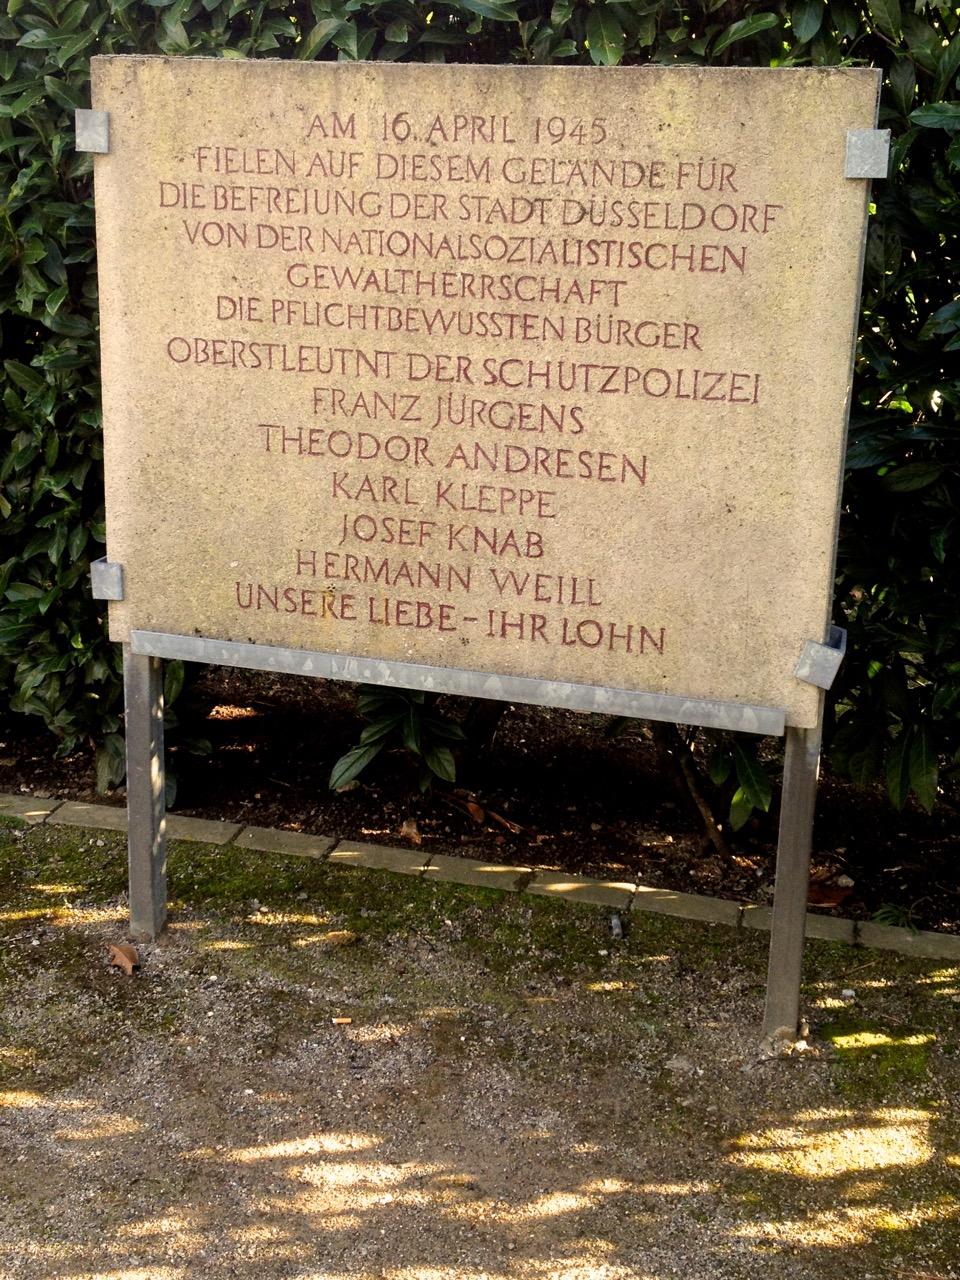 17. April 1945 – Tag der Befreiung in Düsseldorf